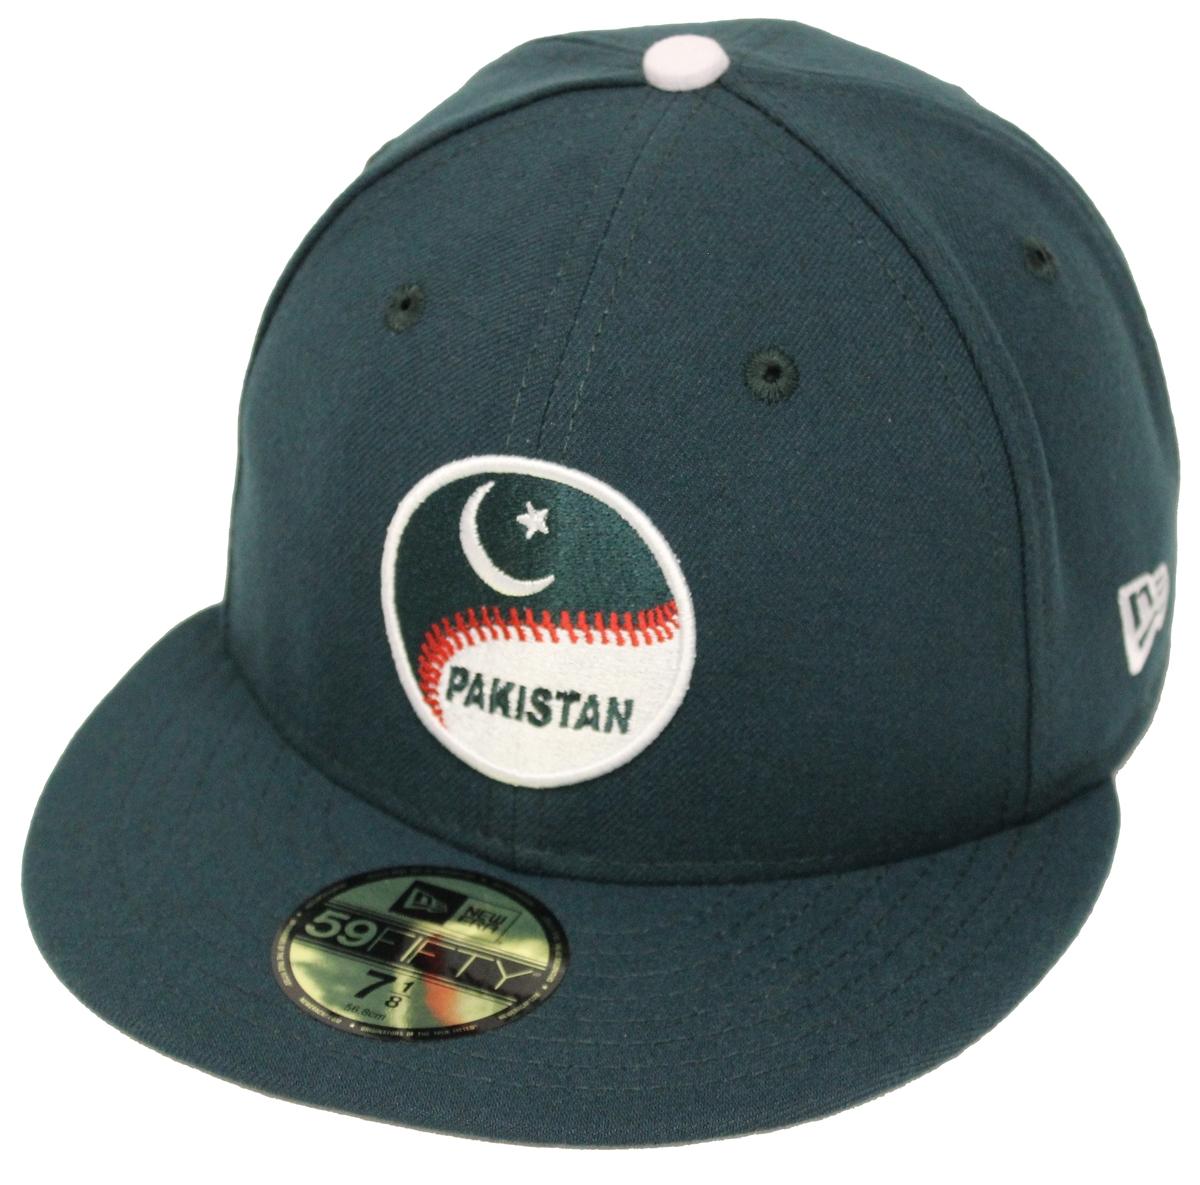 New Era 59Fifty WBC Pakistan Dark Green Fitted Cap 3483e55dbc0